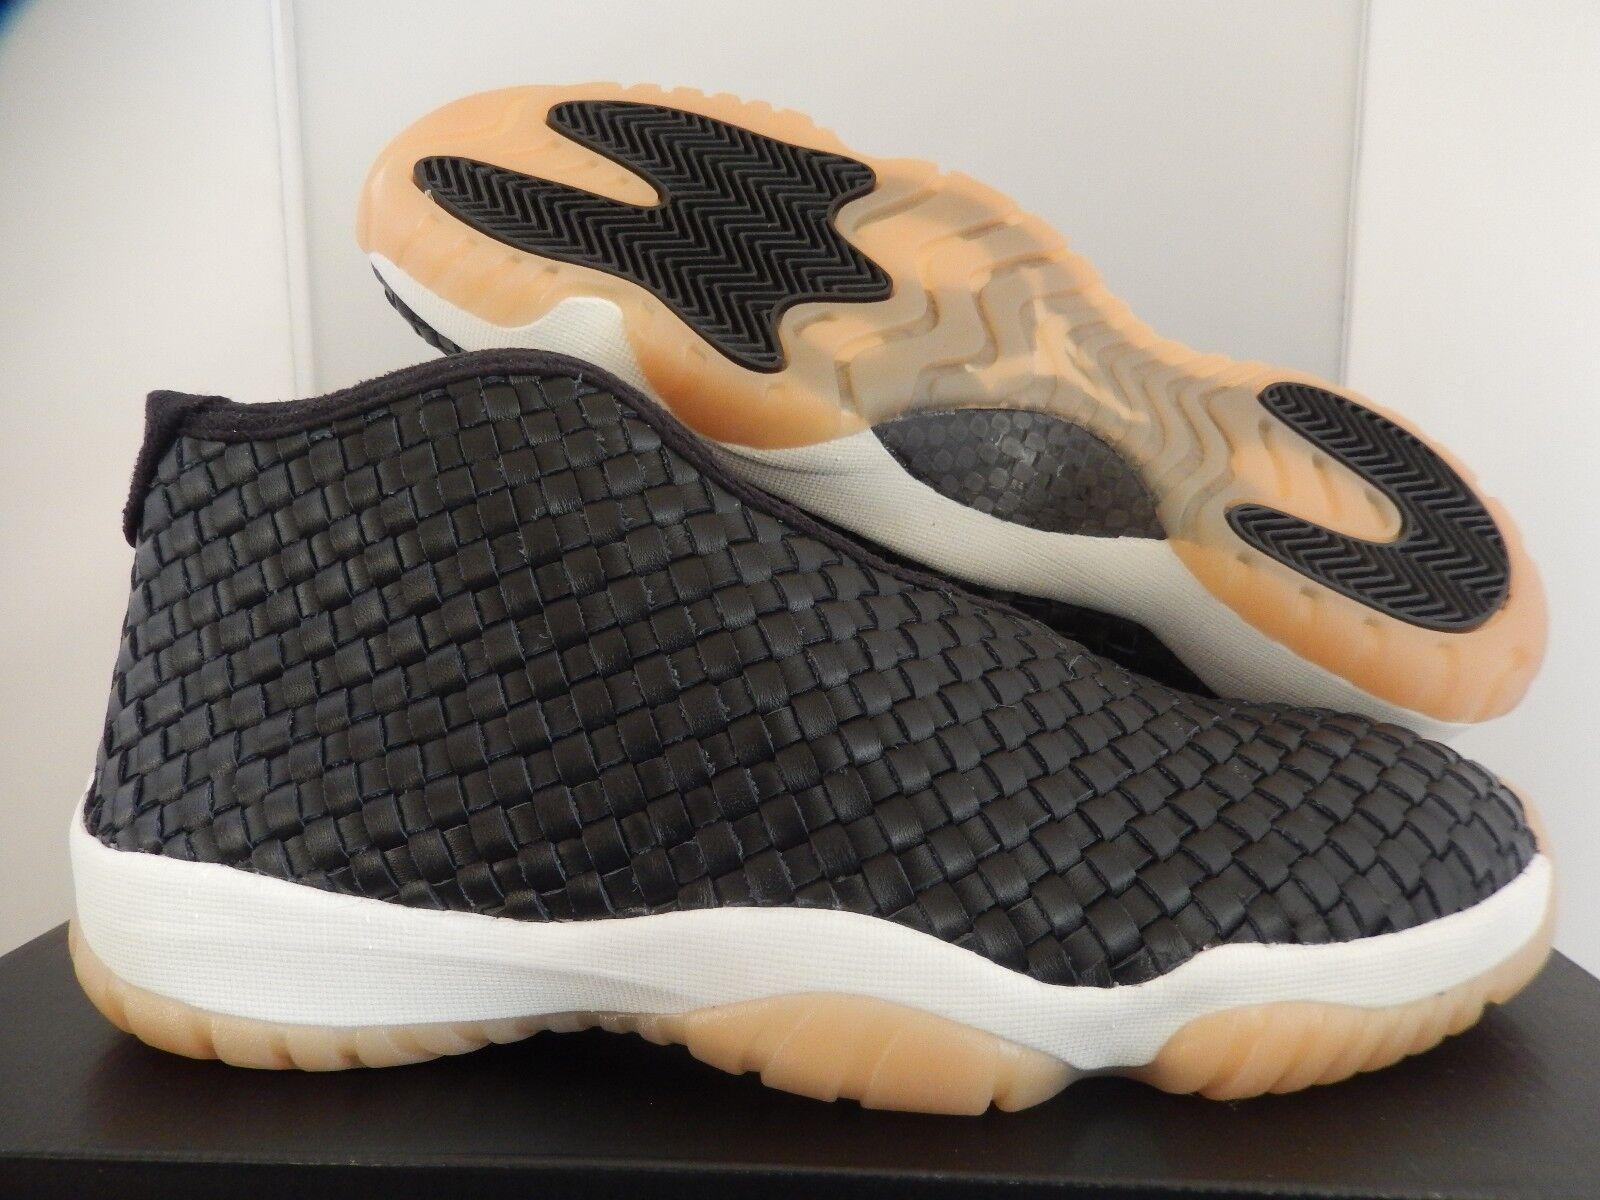 174782b903ae Nike Air Jordan Future Premium Black-sail-gum Yellow Sz 12 652141 ...